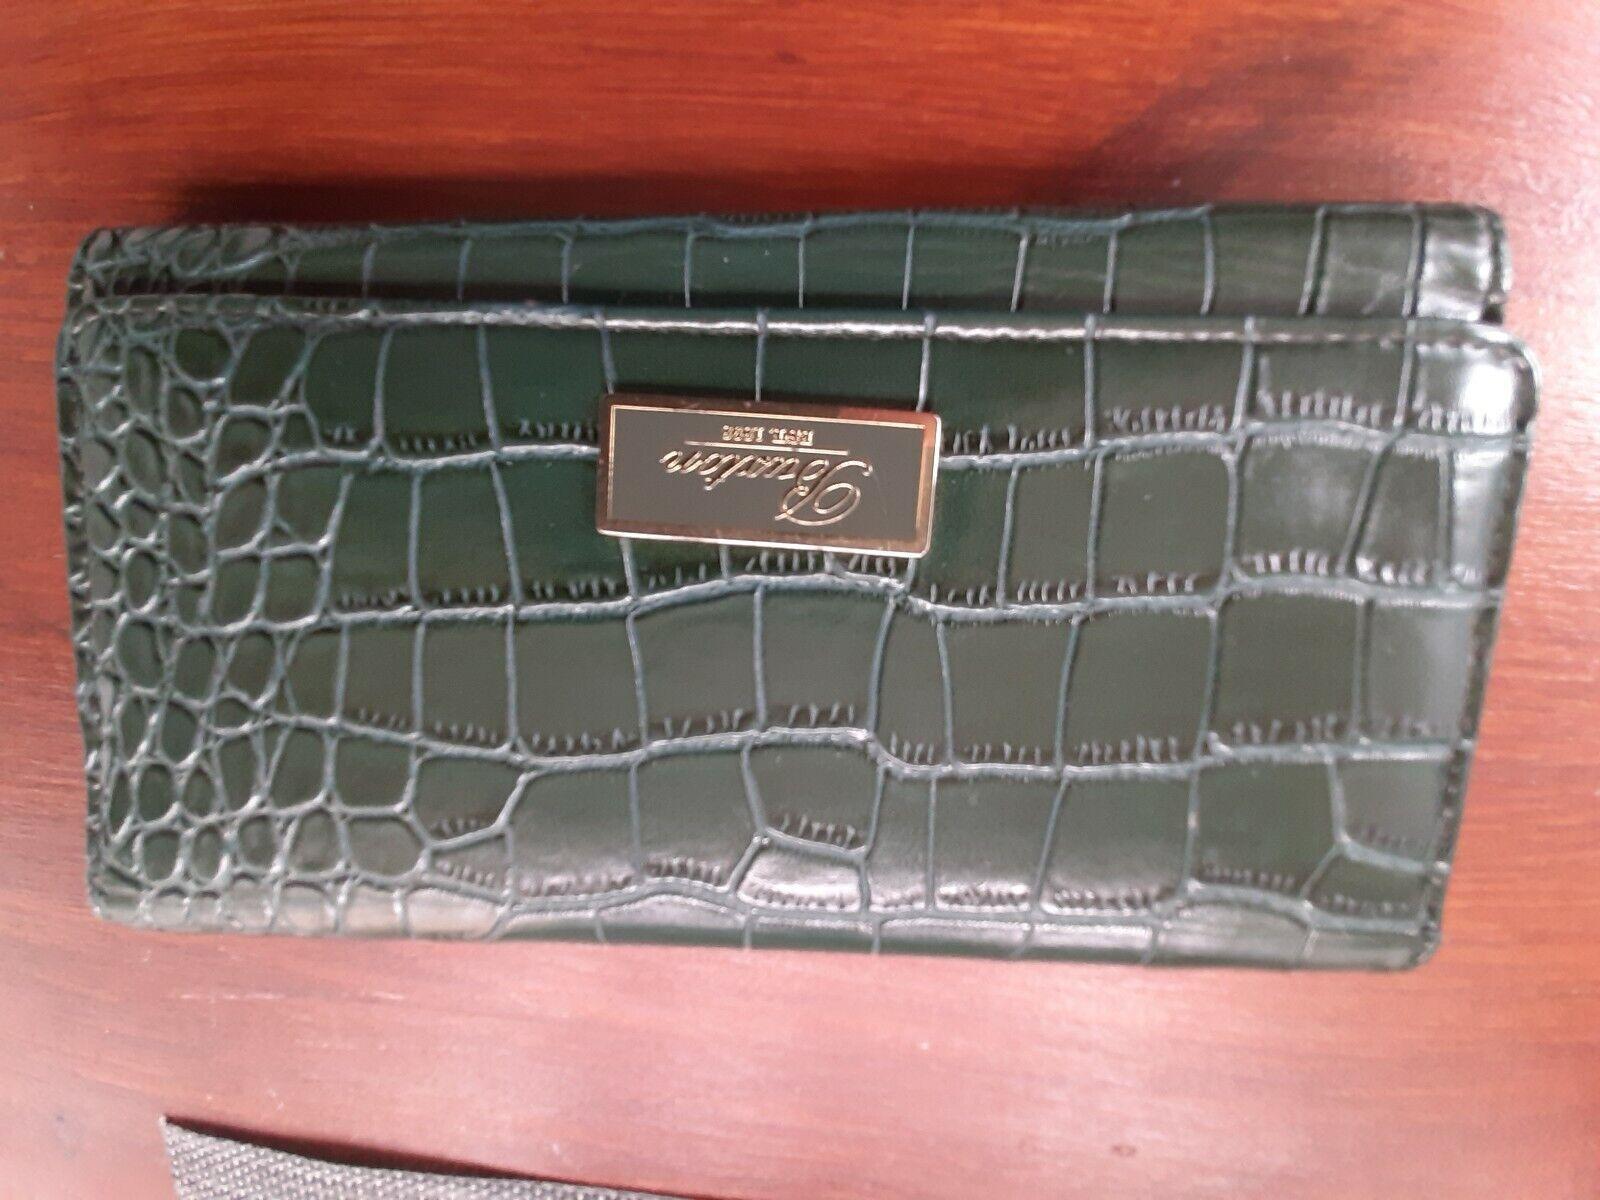 BUXTON EST 1898 Green Trifold Leather Purse Vintage